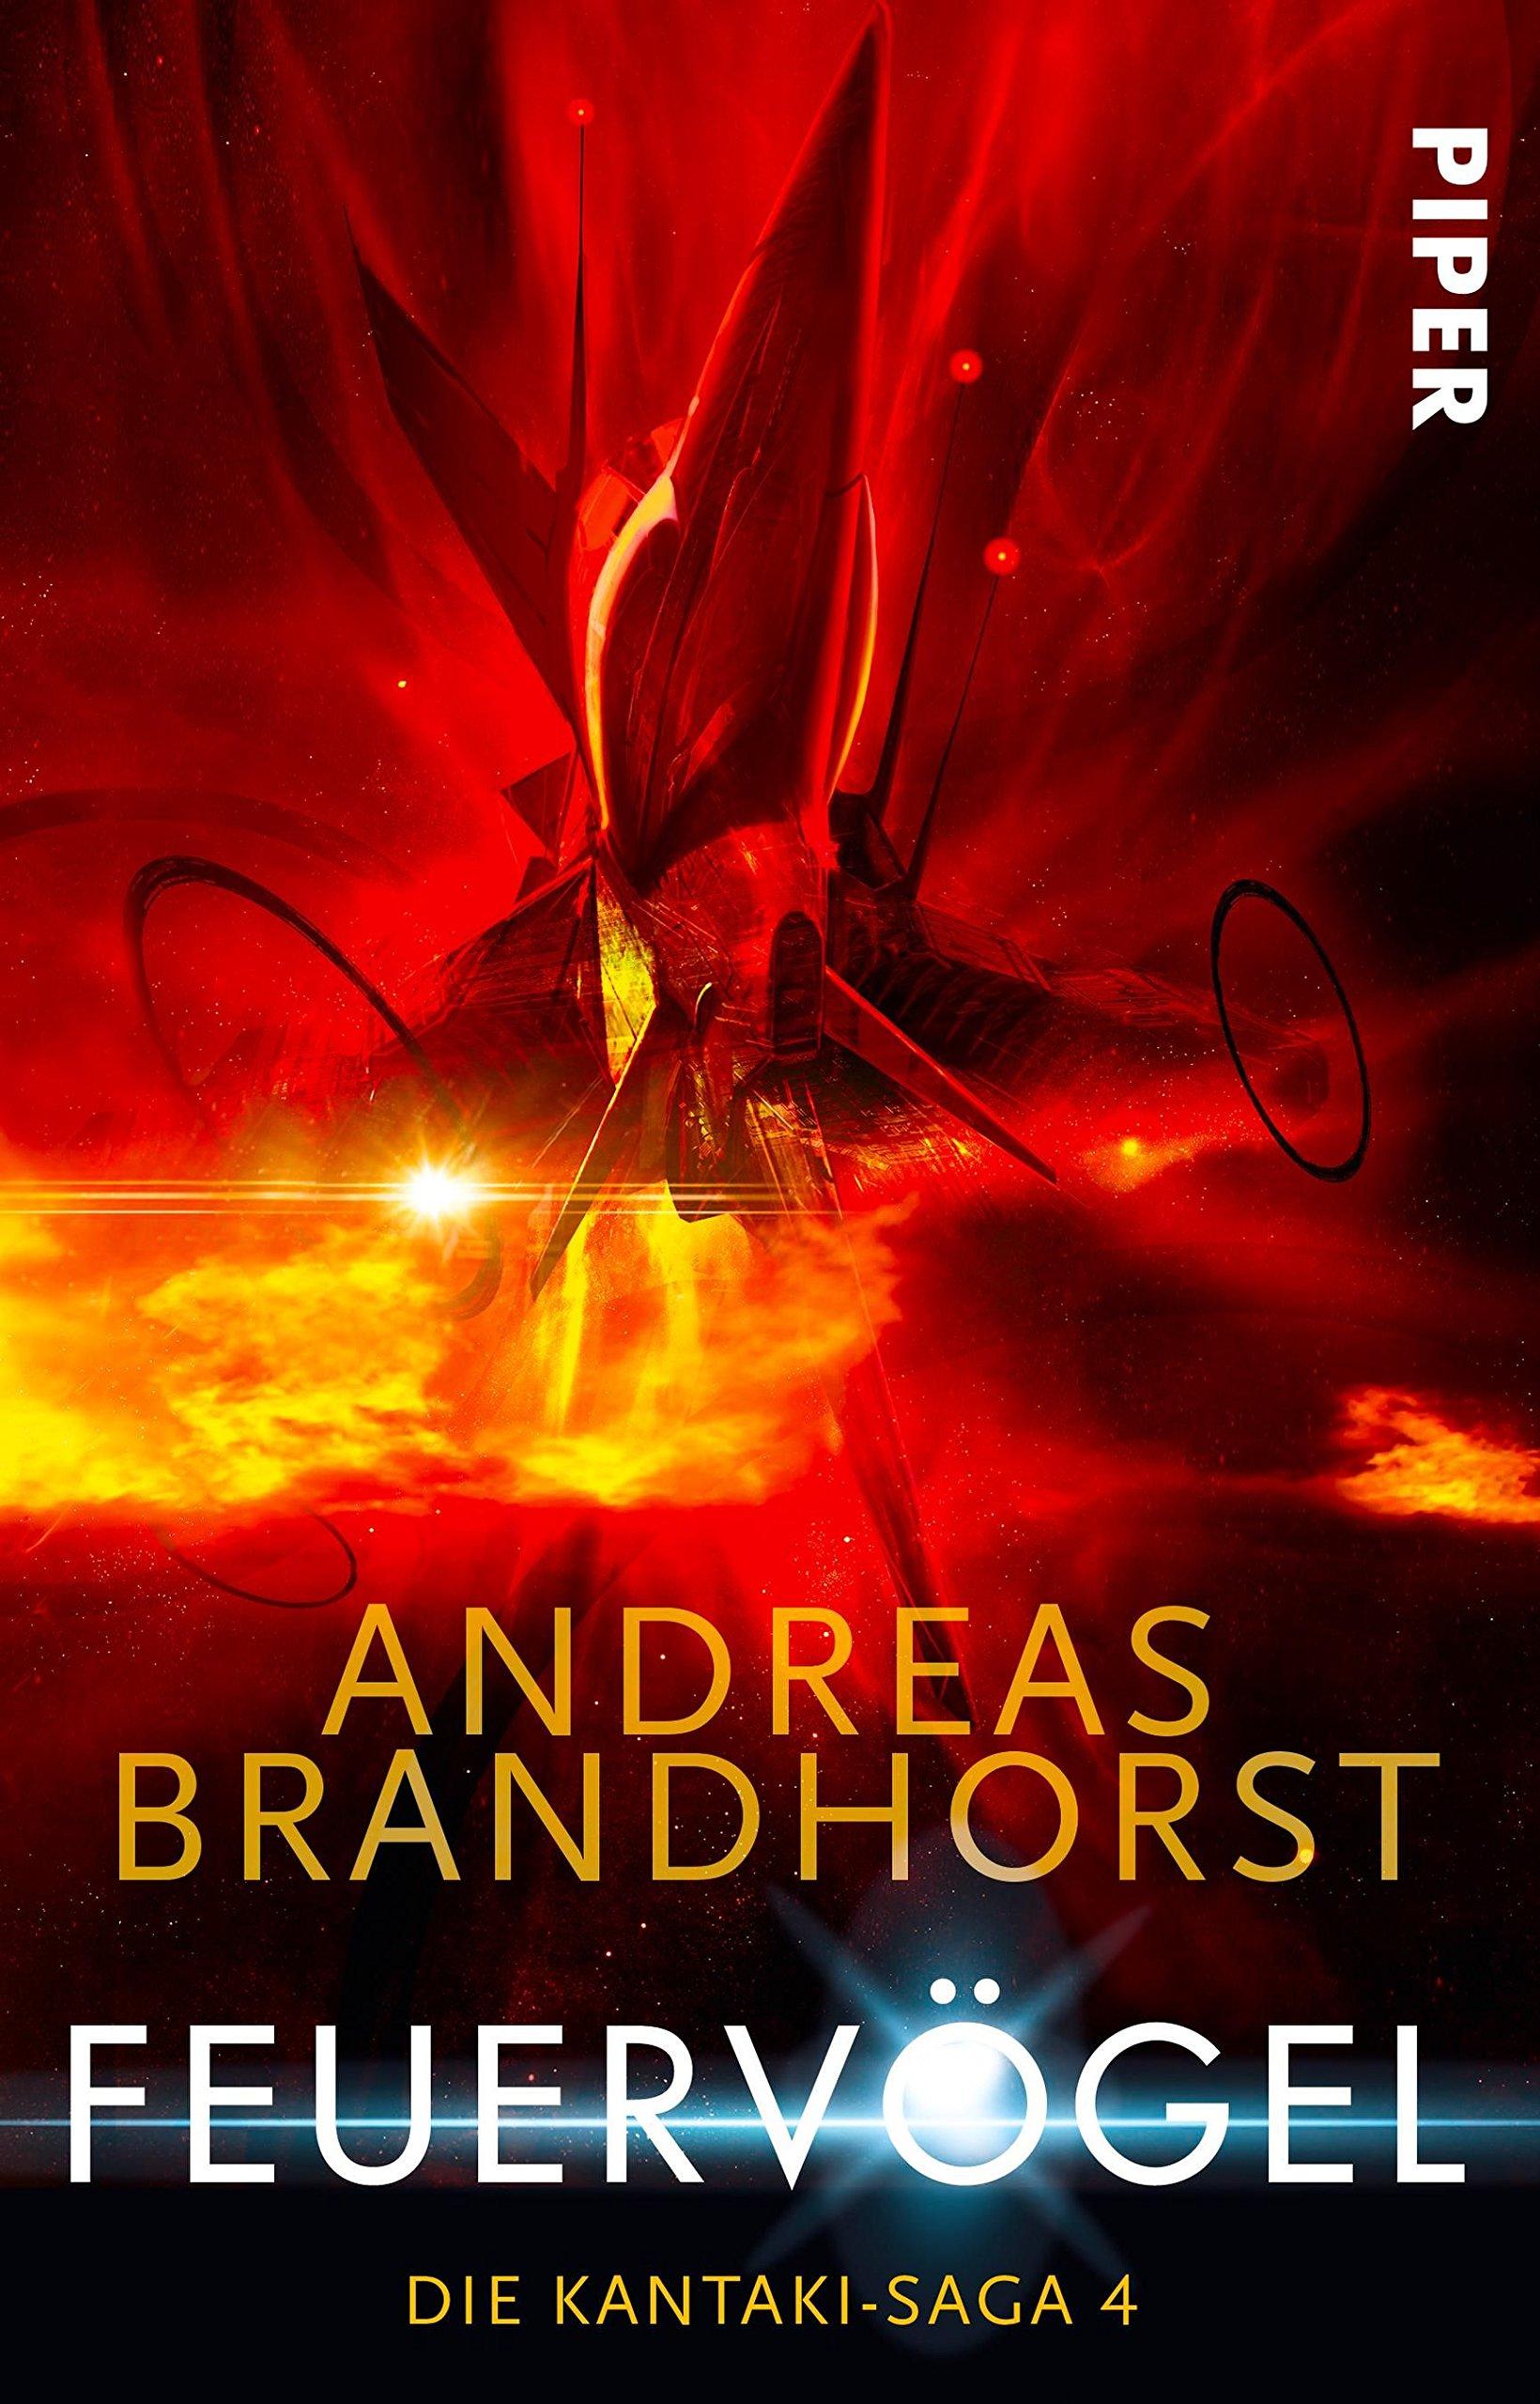 Feuervögel: Die Kantaki-Saga 04: Amazon.co.uk: Andreas Brandhorst:  9783492281249: Books